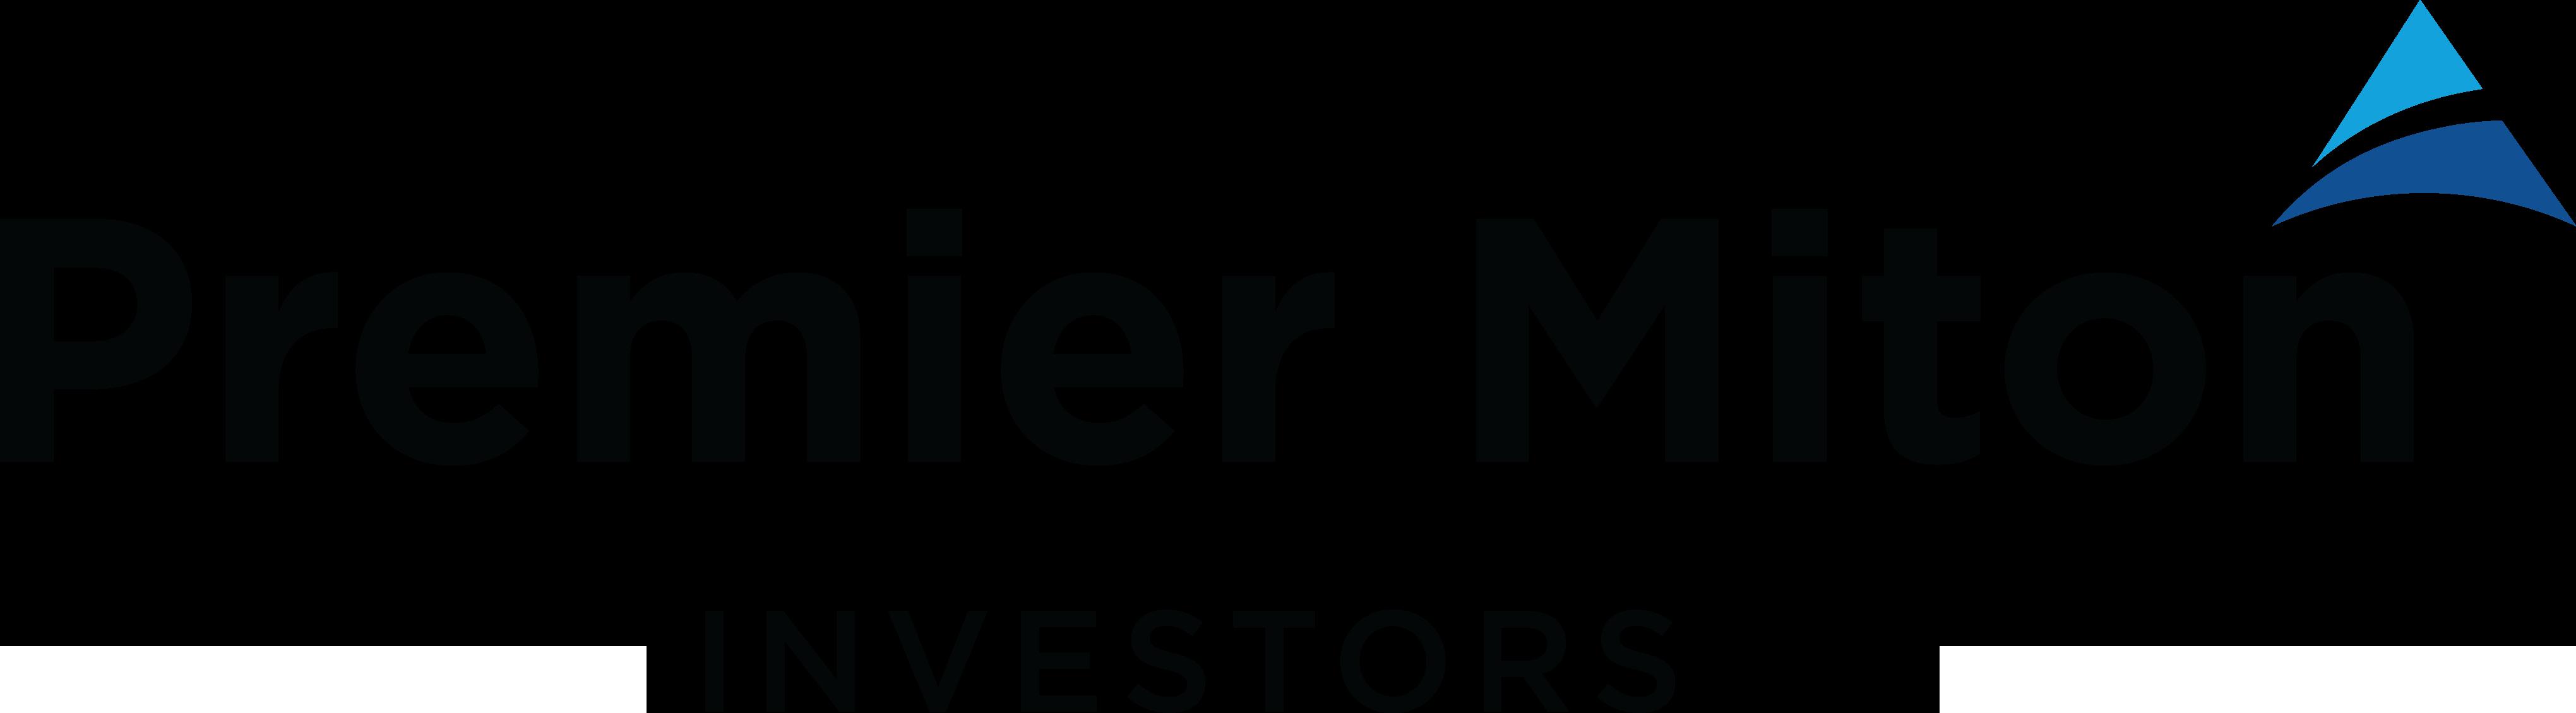 Acorn Income Fund Ltd Logo